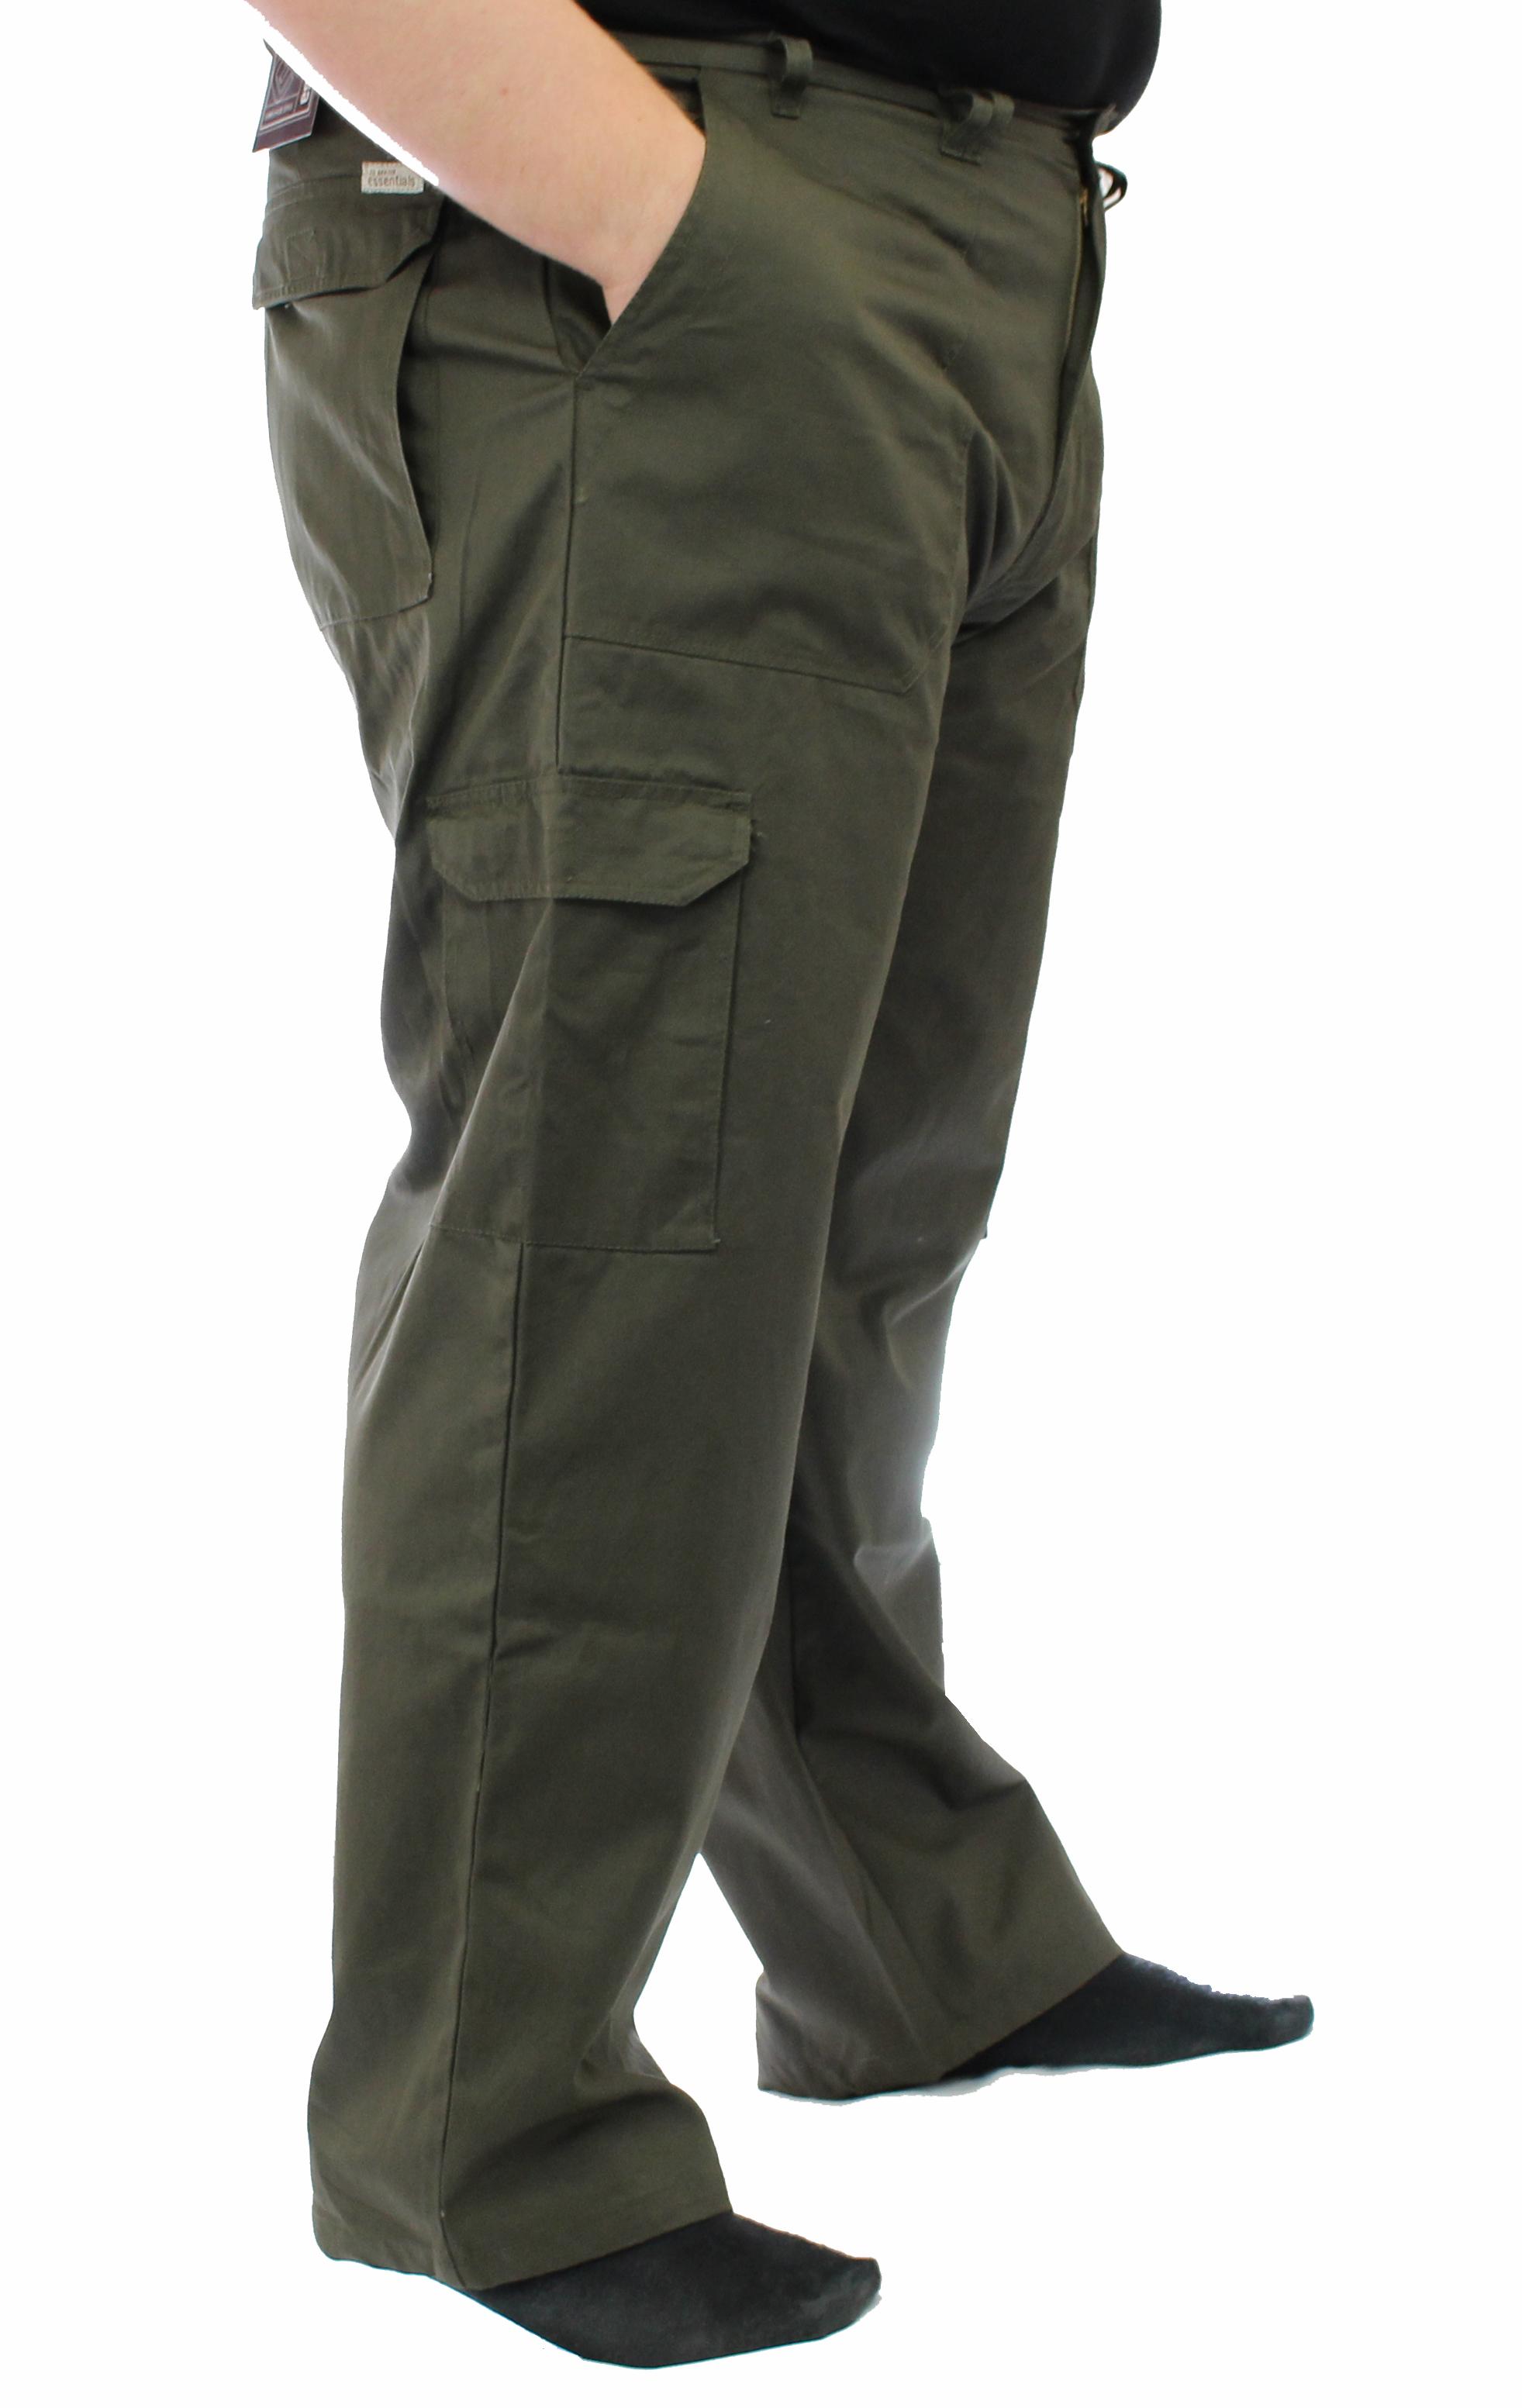 "Ed Baxter Victory - Heavy Duty Cargo Combat Trousers - Khaki - 42"" Waist, 34"" Leg"